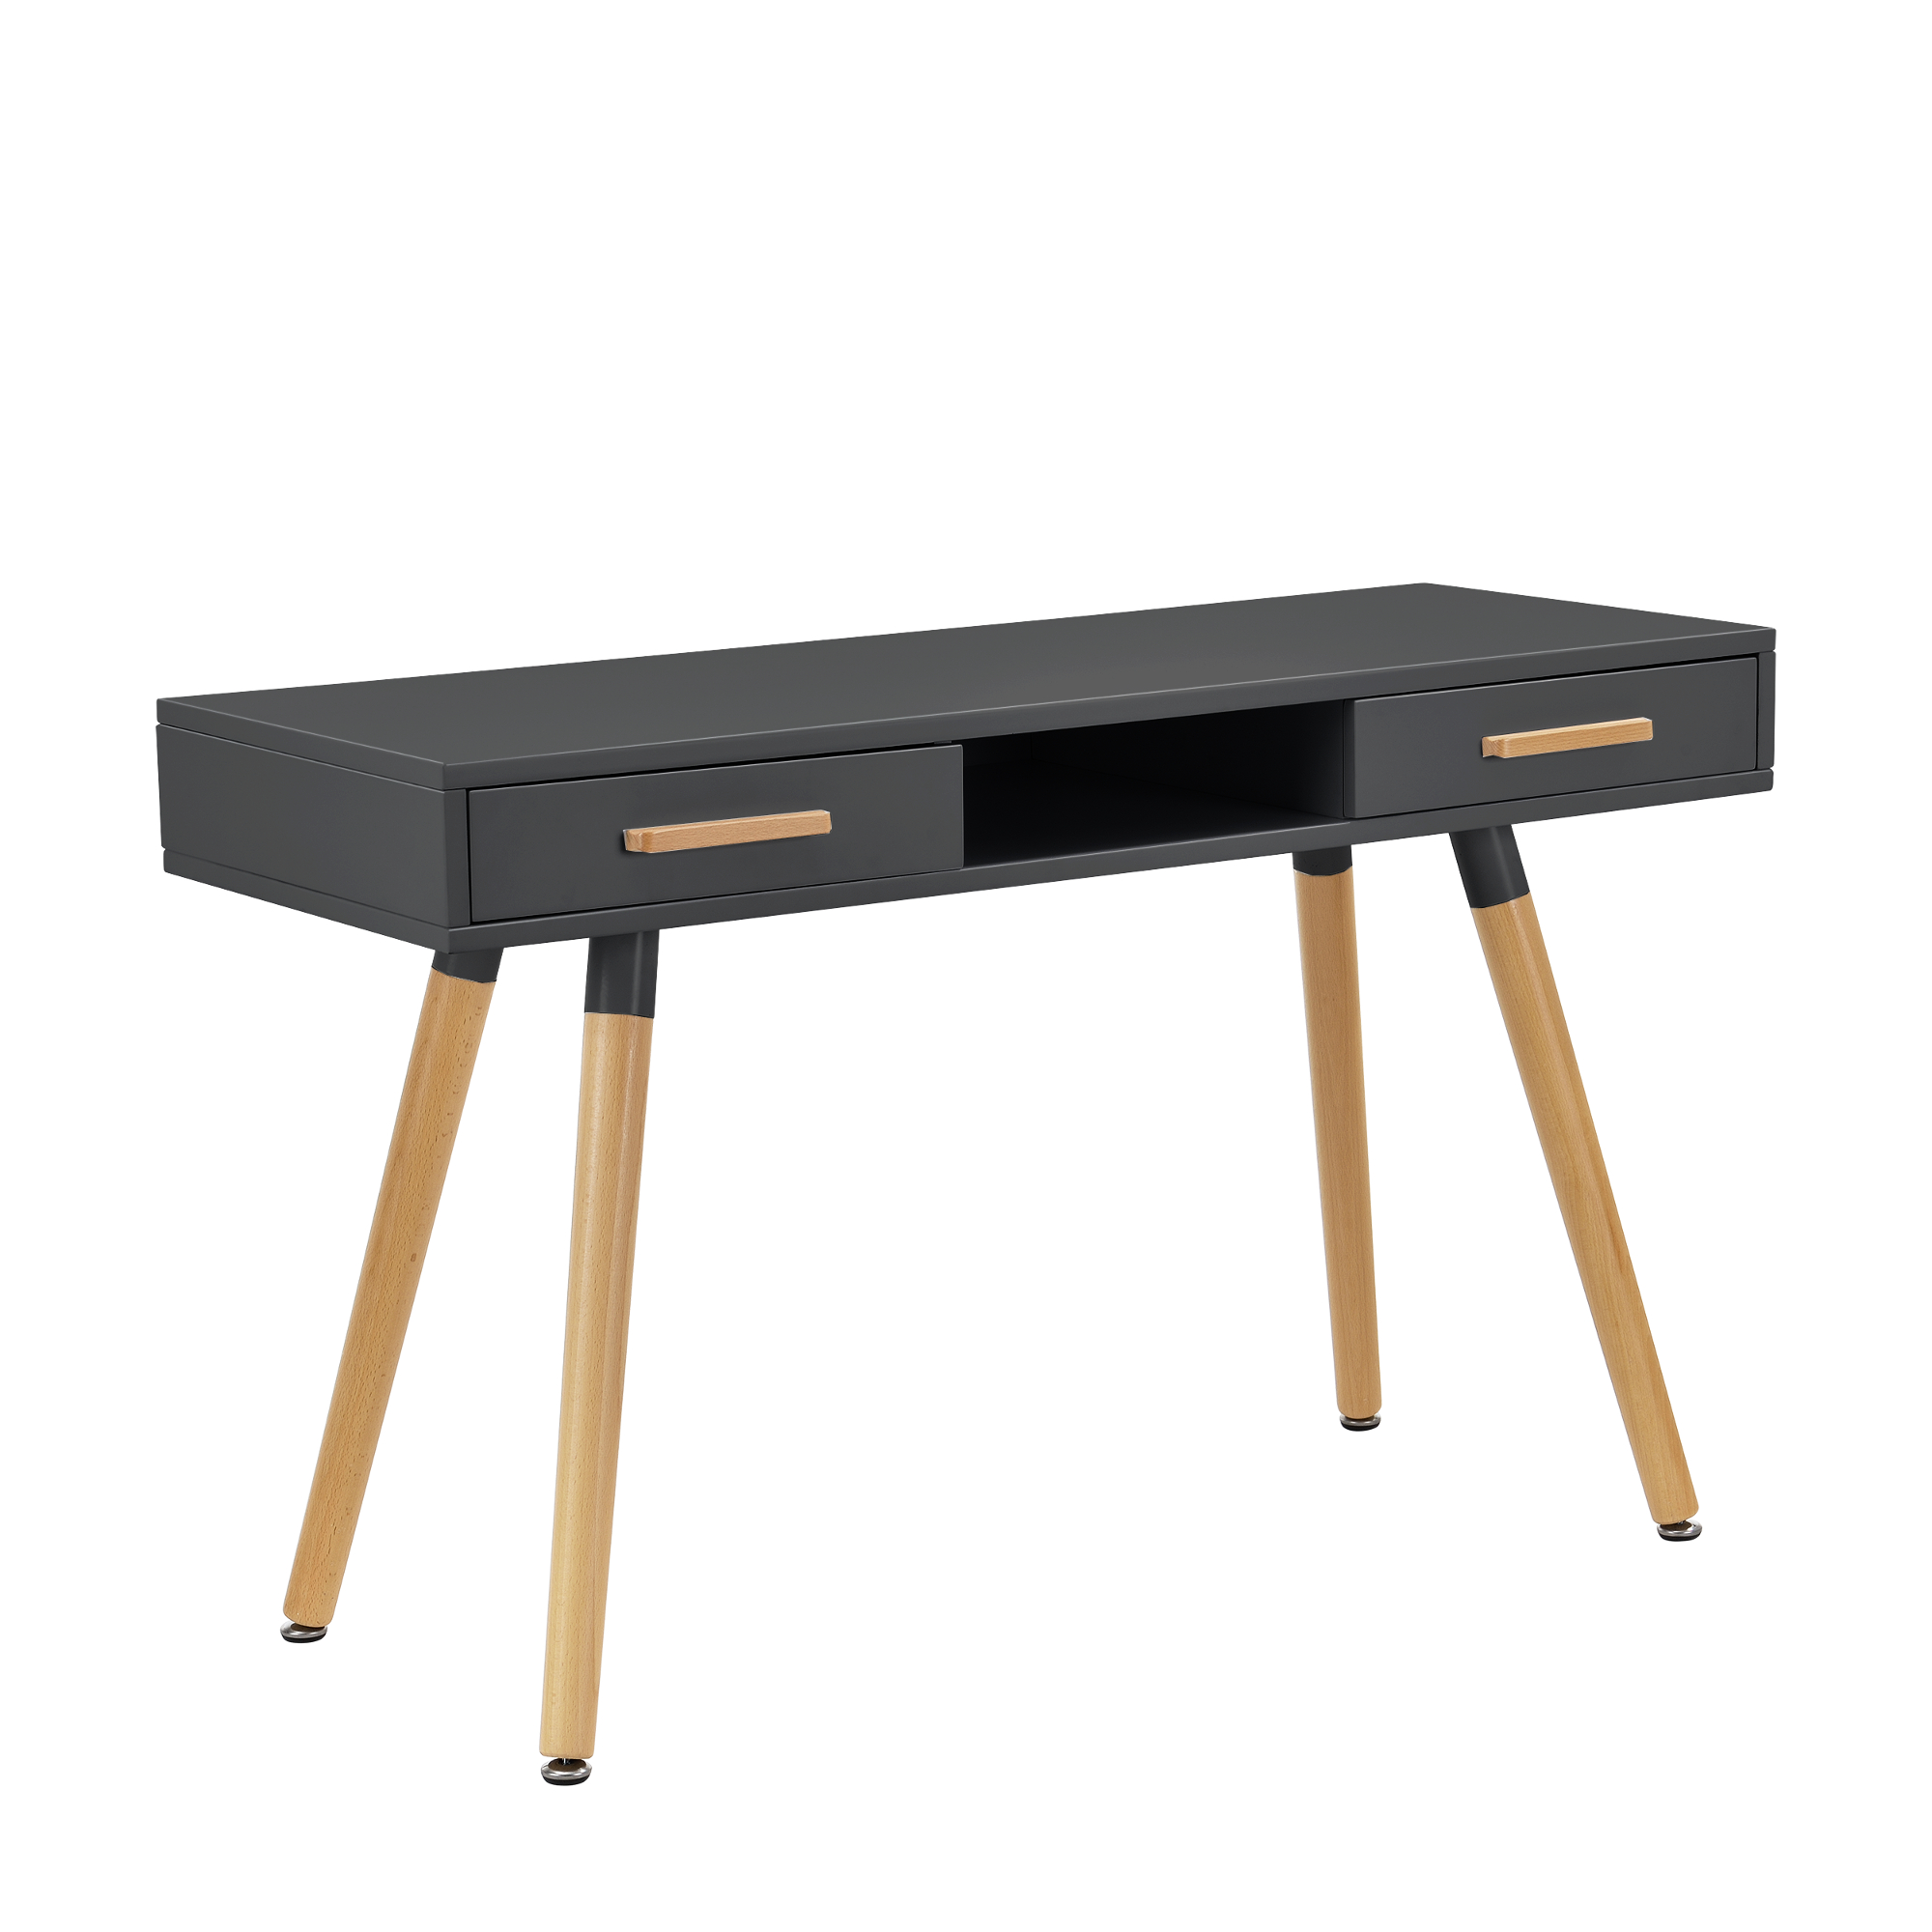 [en.casa]® Birou retro cu sertar si scaun, MDF/plastic, 75 x 120 x 45 cm, gri/alb